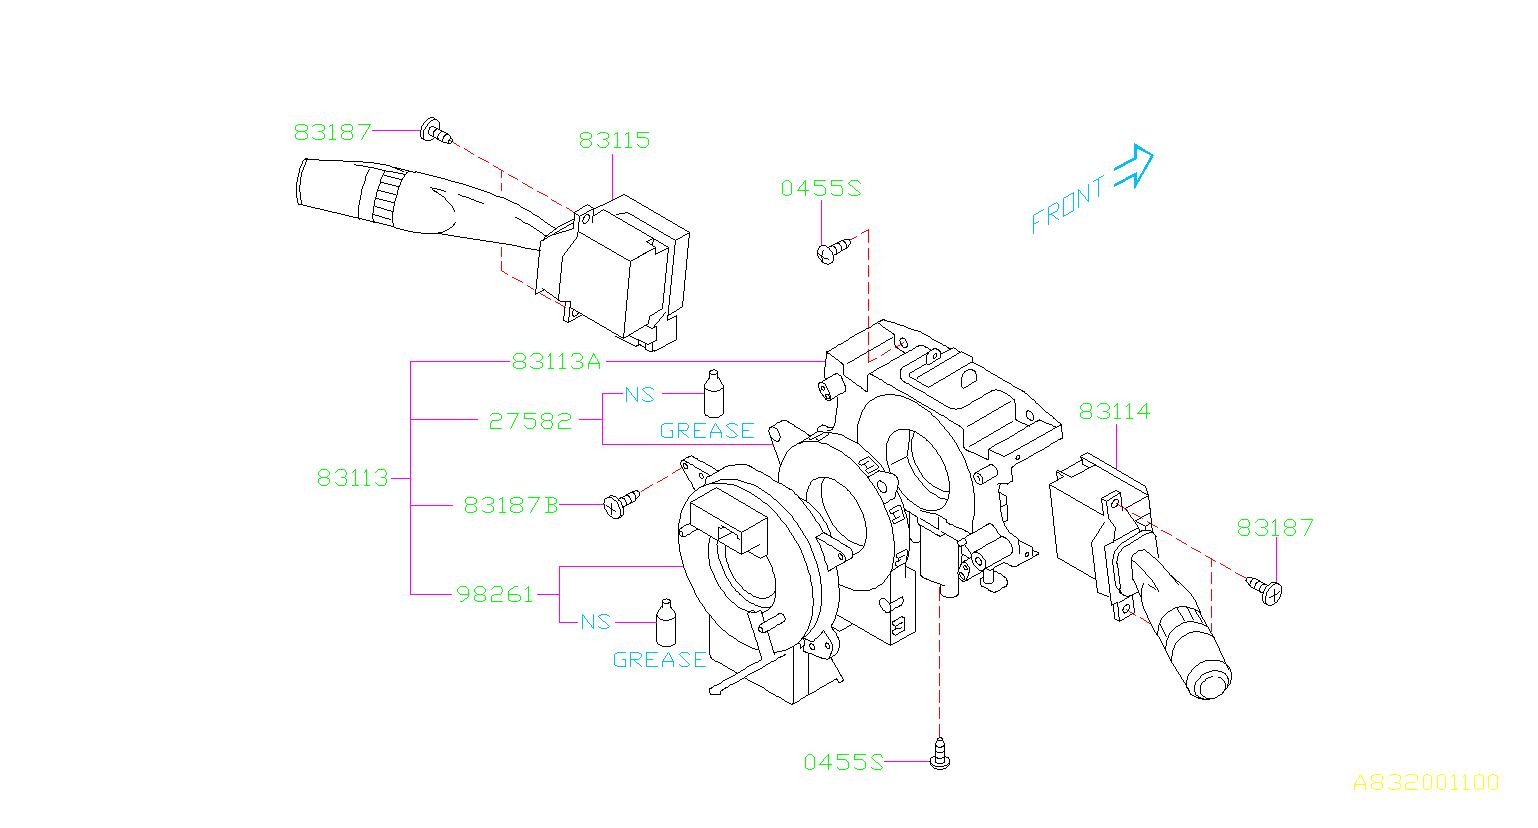 2011 Subaru Forester Sensor-steering angle. Combination